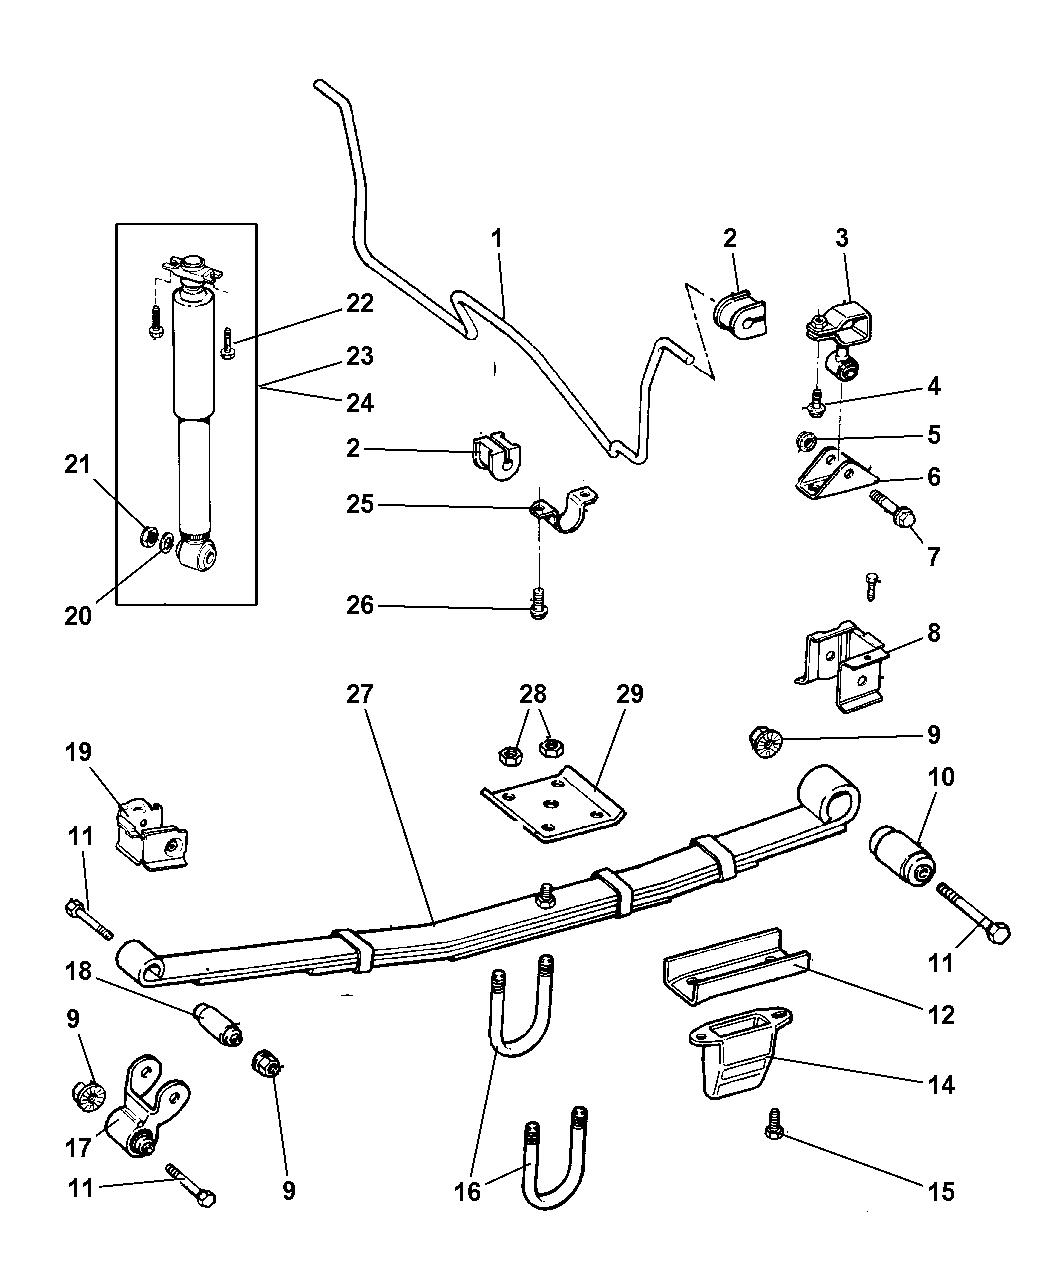 1999 jeep cherokee suspension - rear & shock absorber